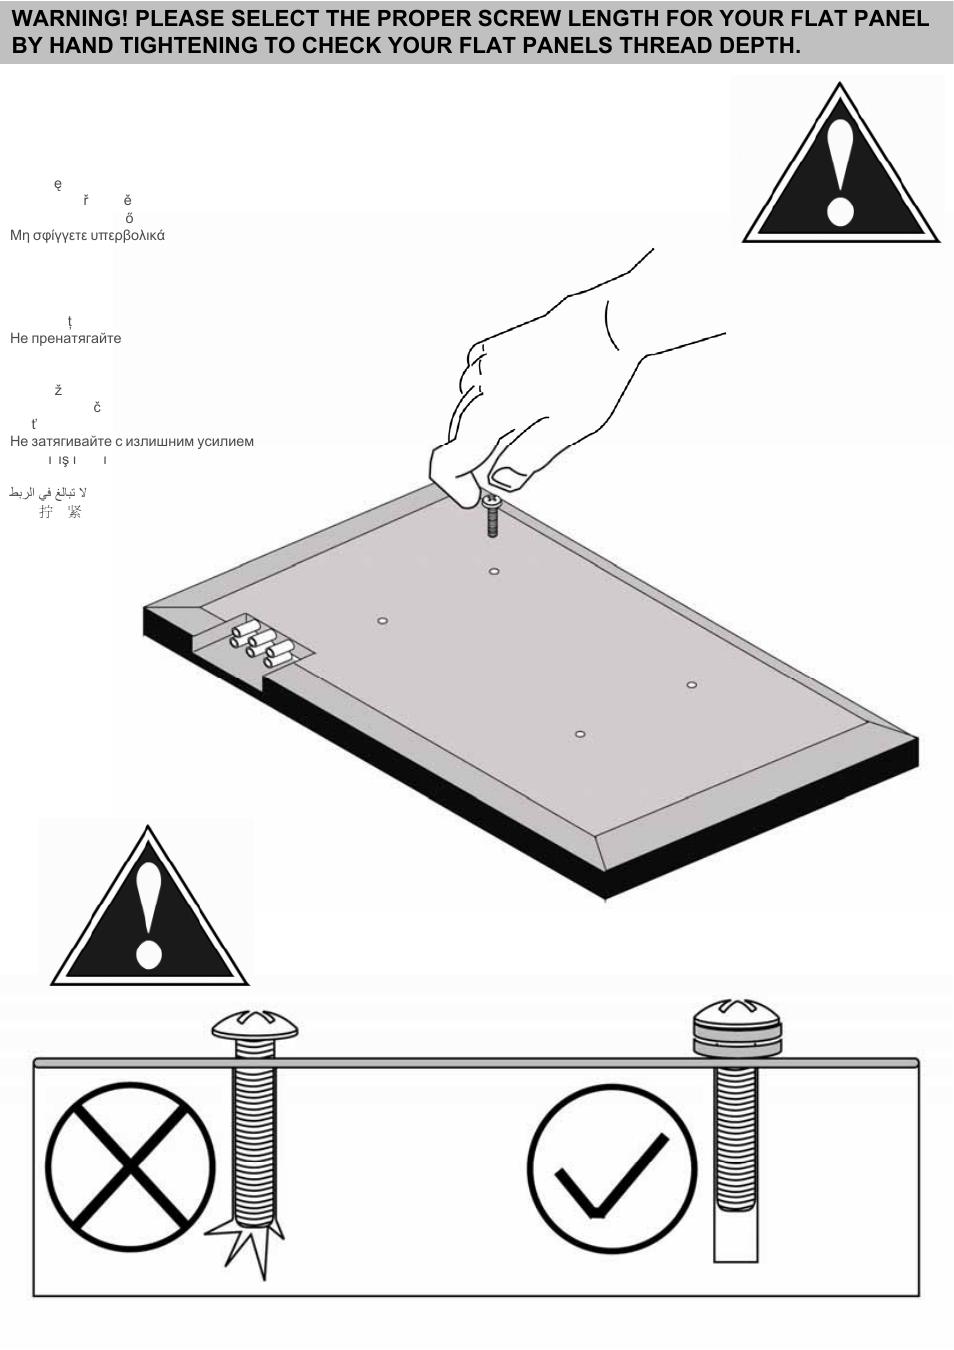 omnimount 4n1 s manual ru user manual page 12 20 rh manualsdir com